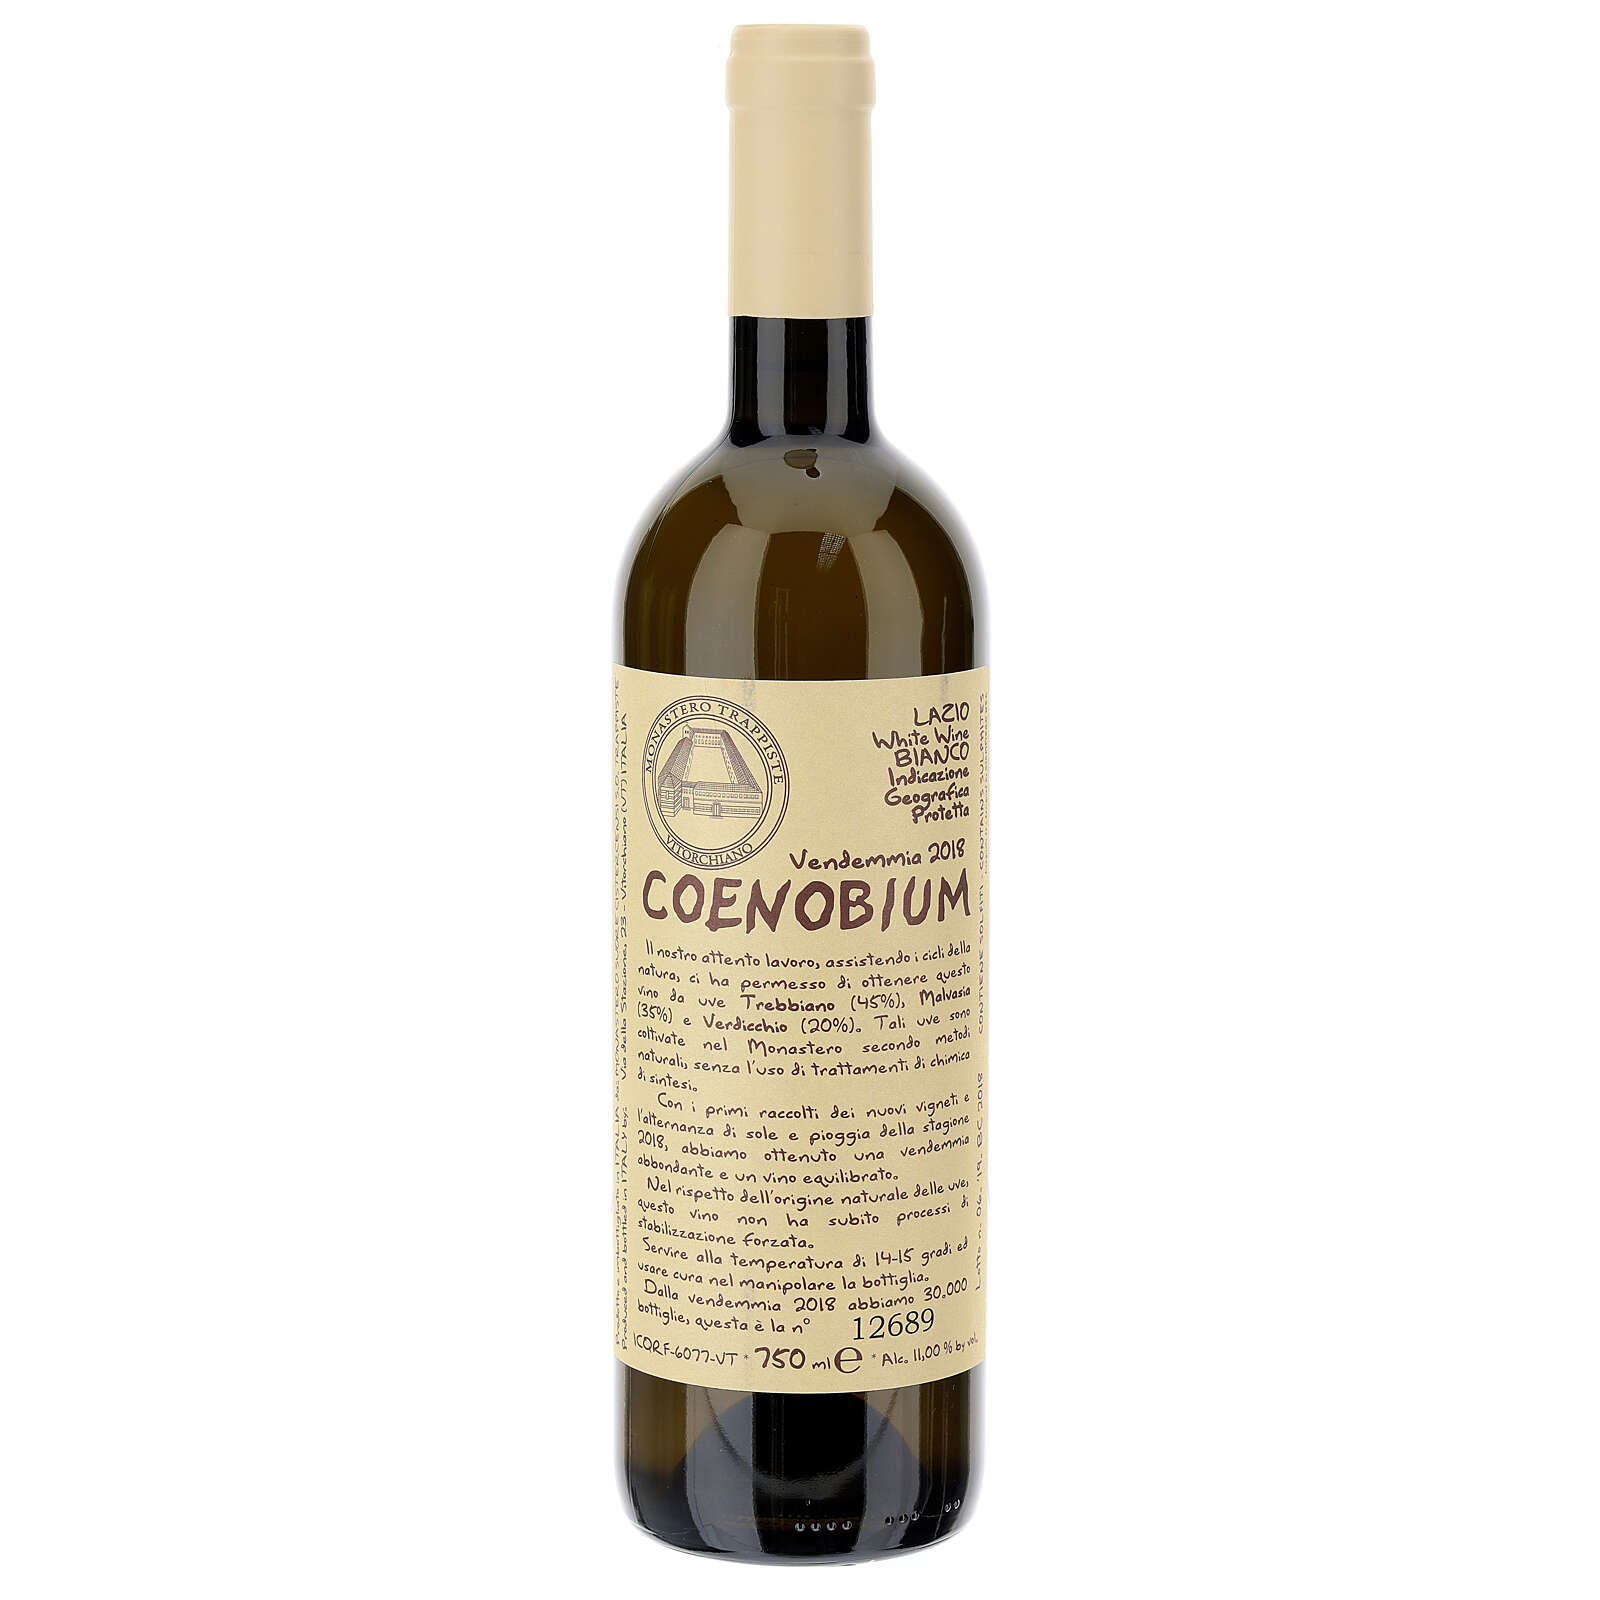 Vino Coenobium bianco Vitorchiano 750 ml vendemmia 2018 3